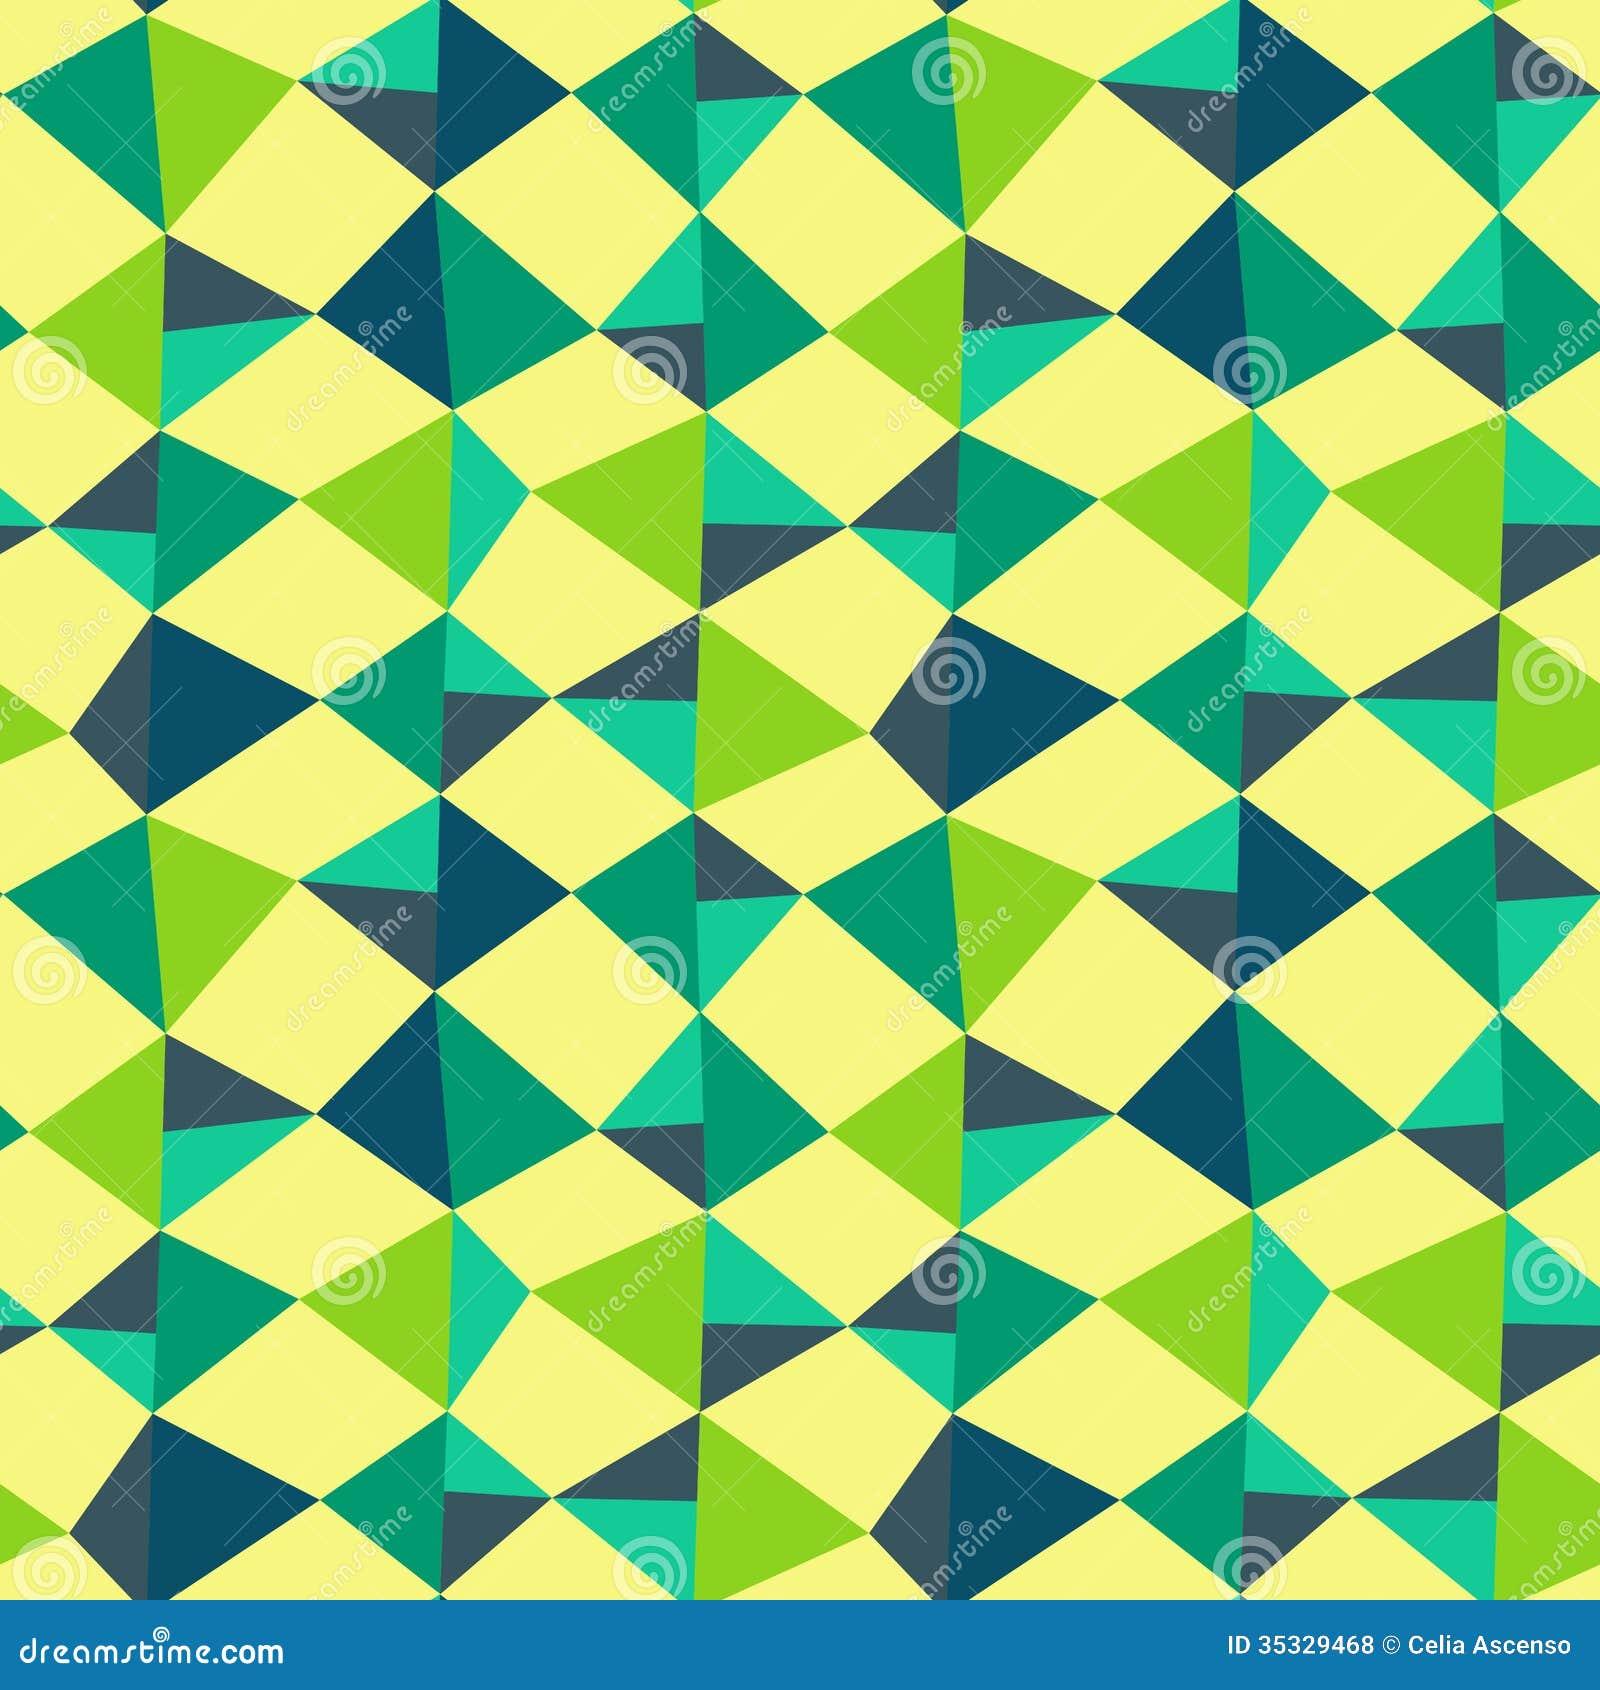 3d hexagon pattern stock vector image 54997696 - Blue